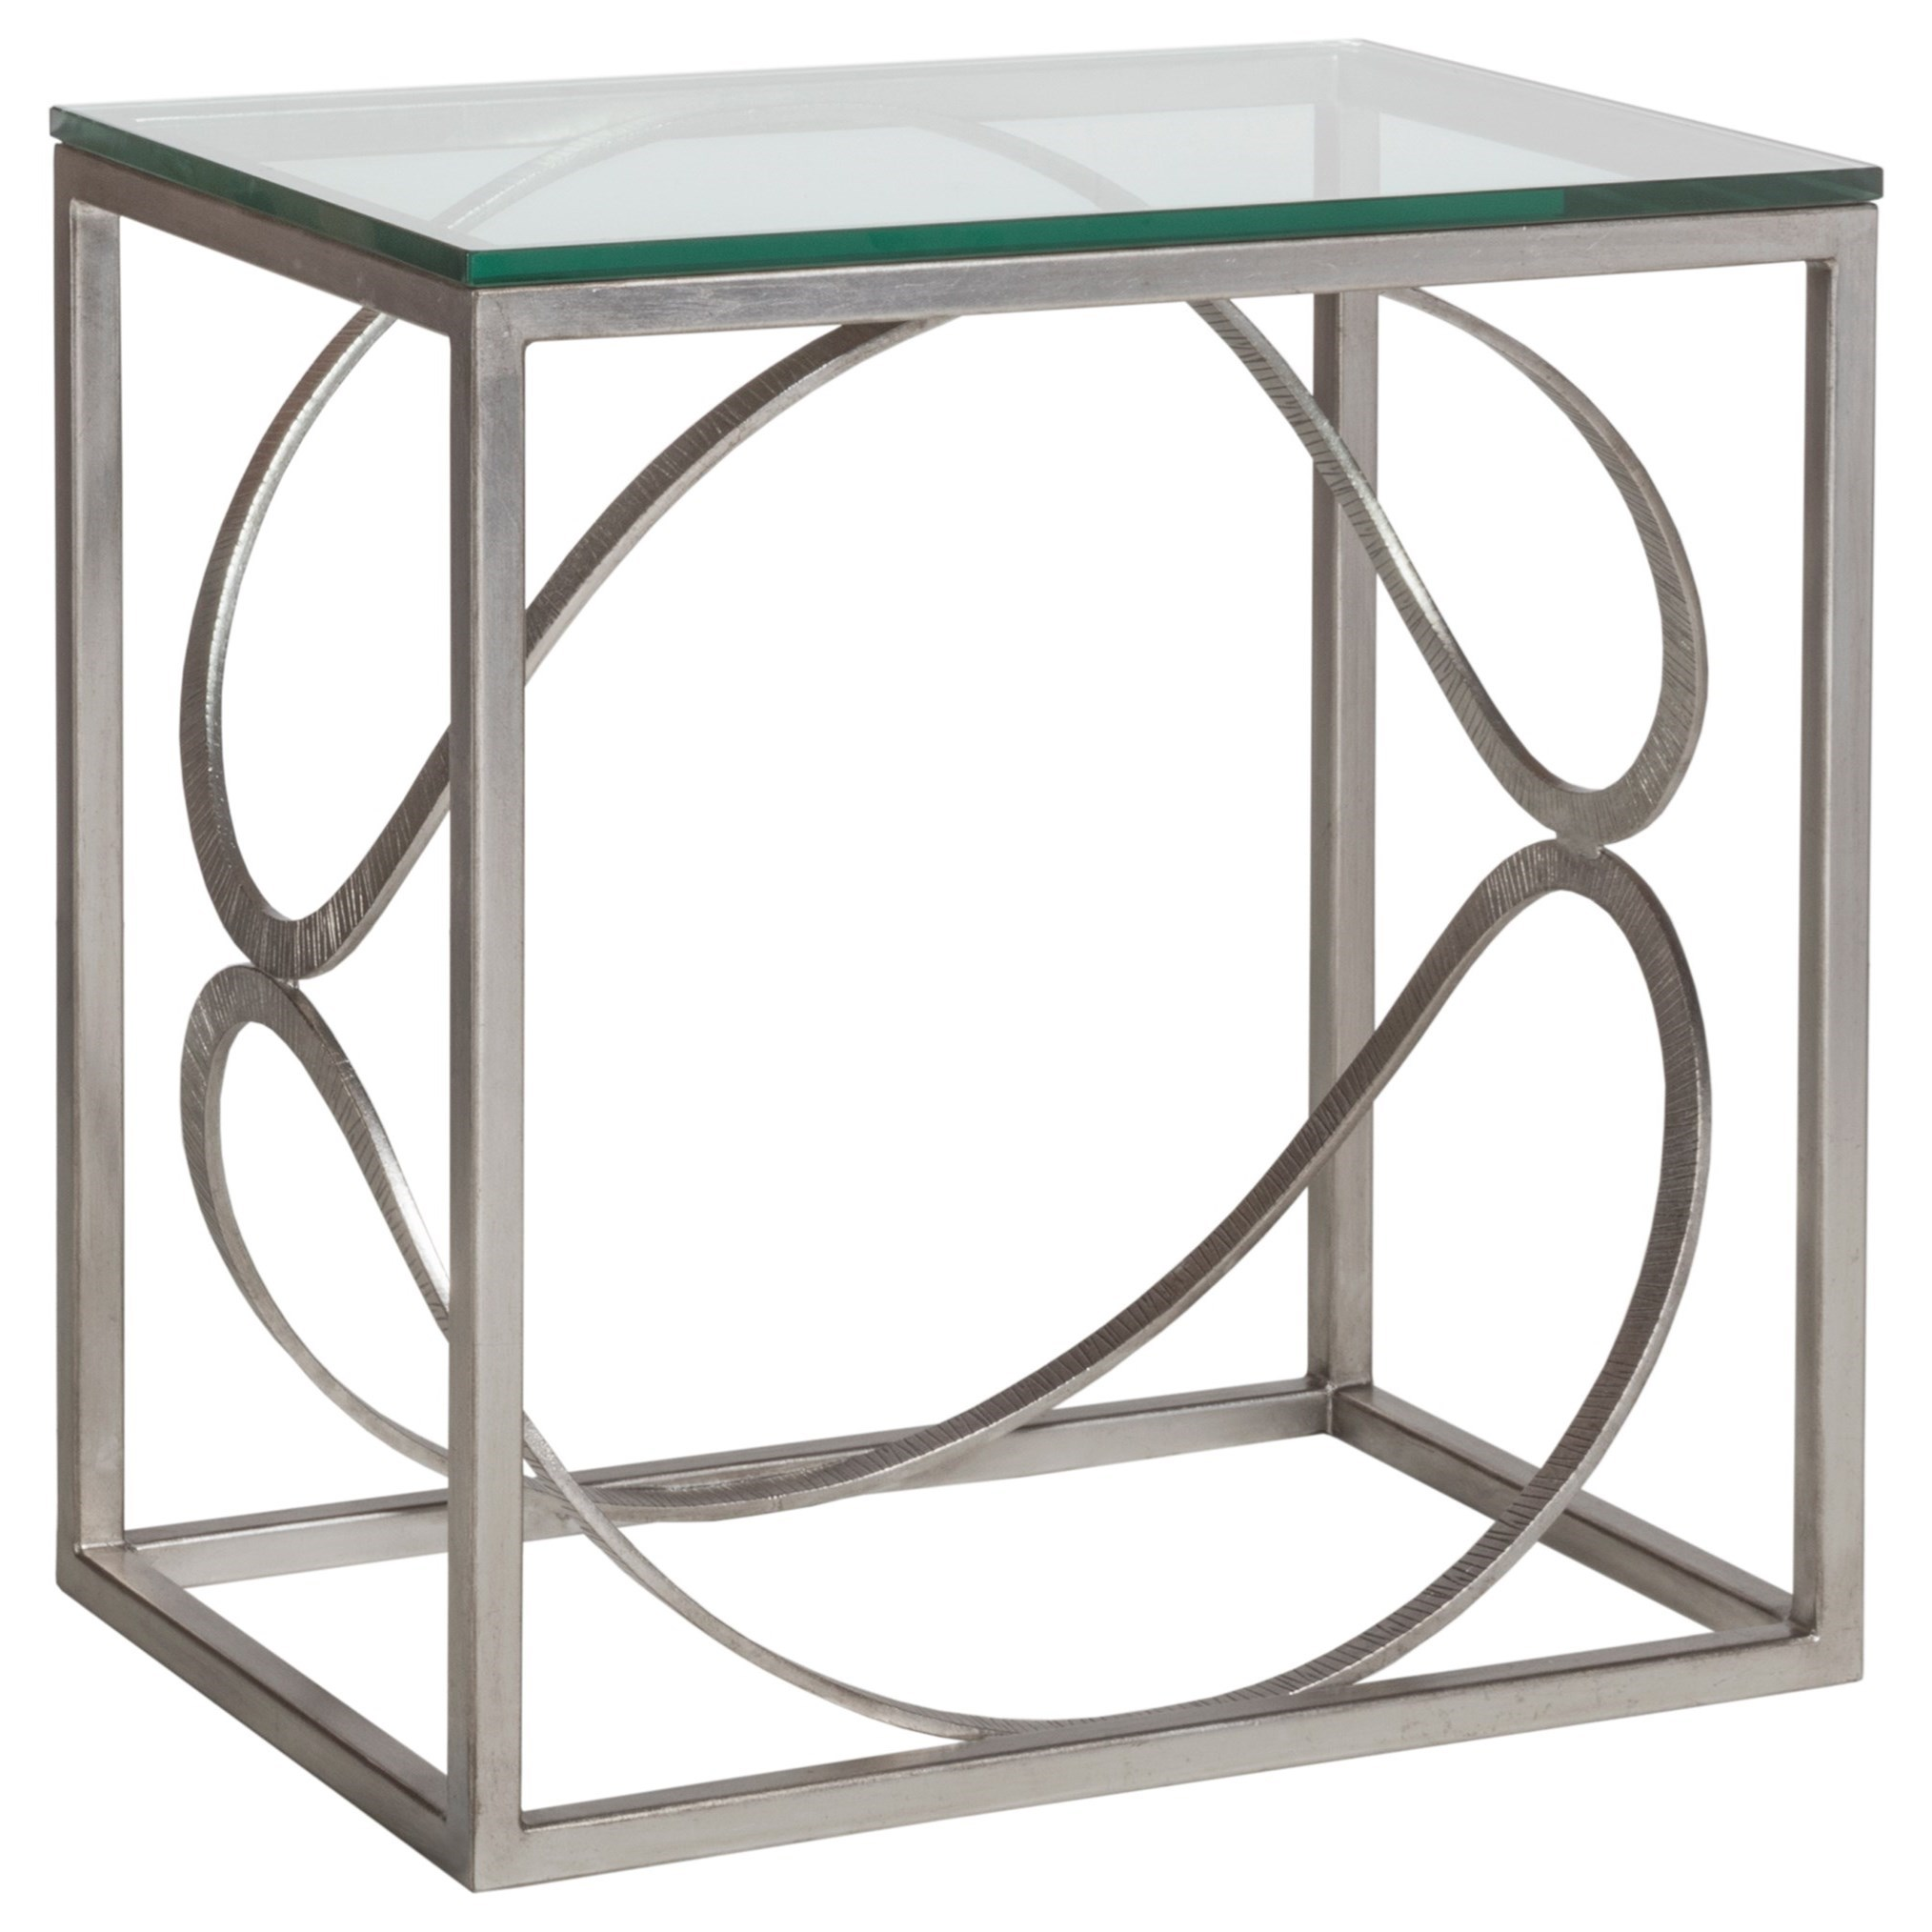 Metal Designs Ellipse Rectangular End Table by Artistica at Baer's Furniture